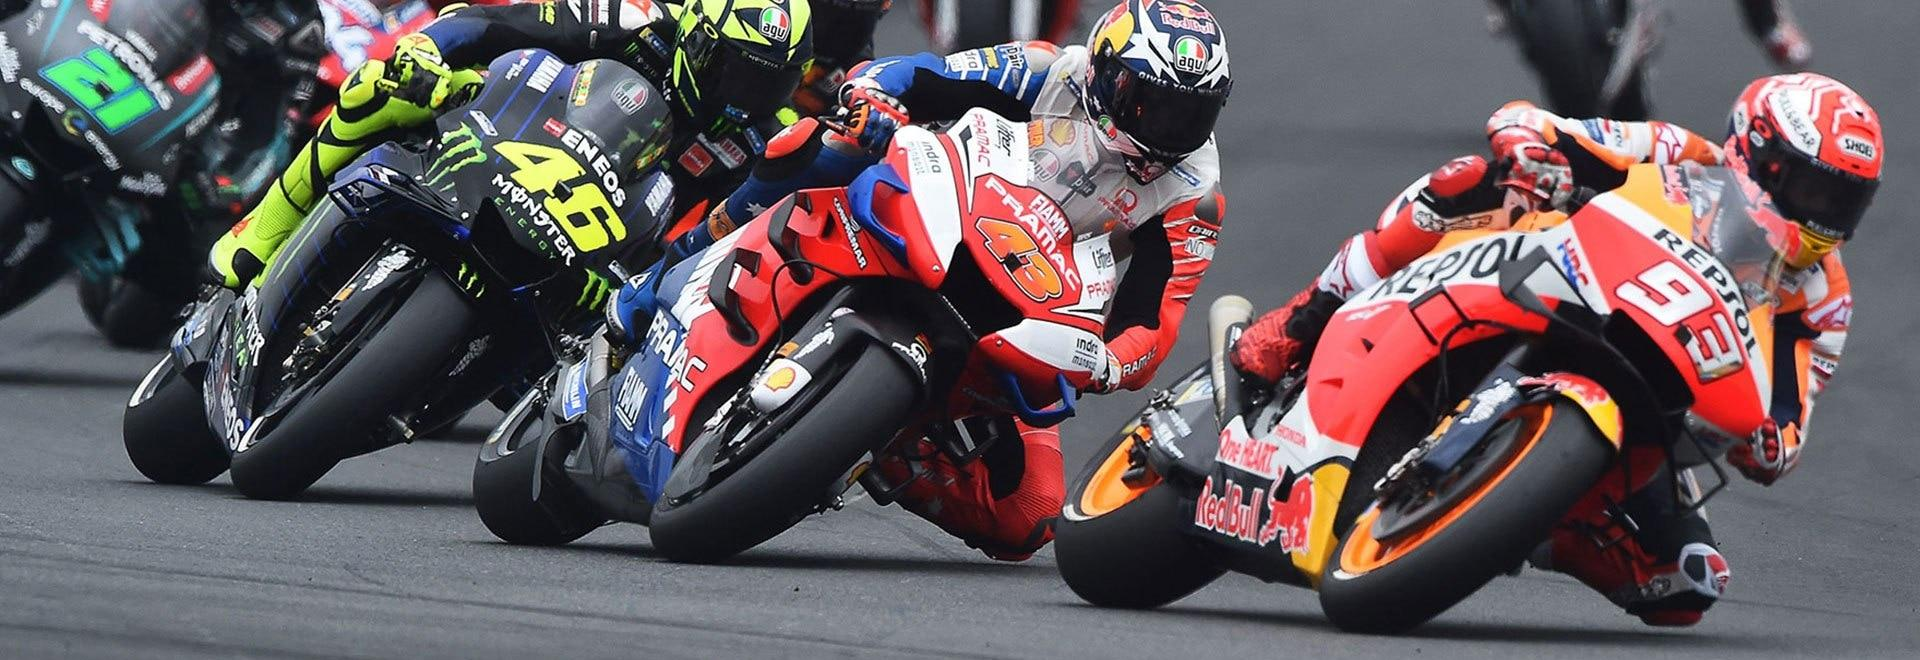 Un anno di MotoGP